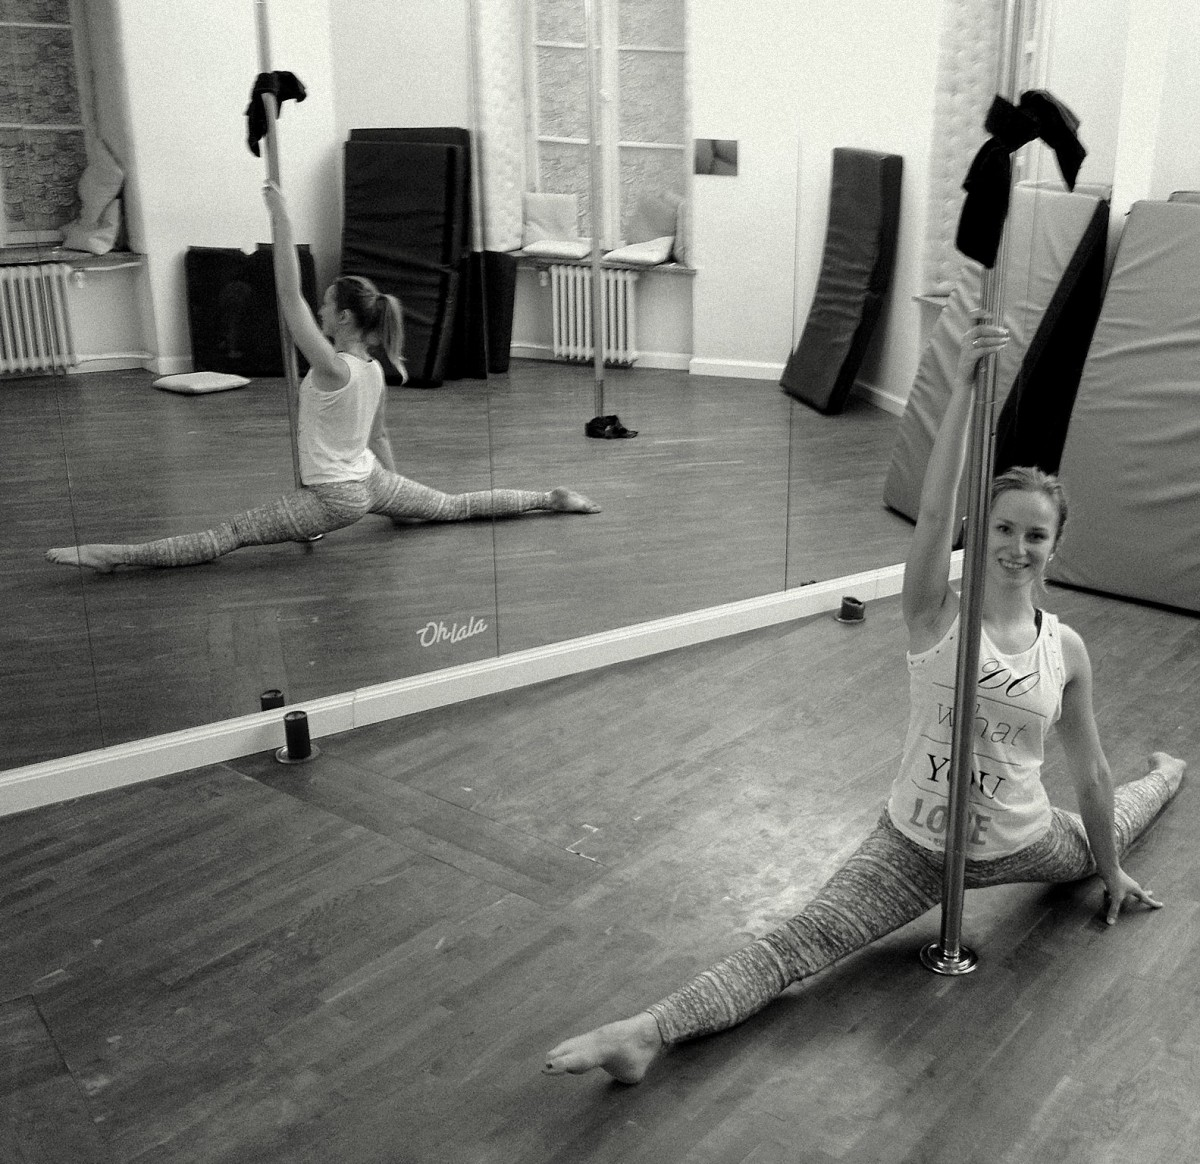 Pole dancerka to nie striptizerka